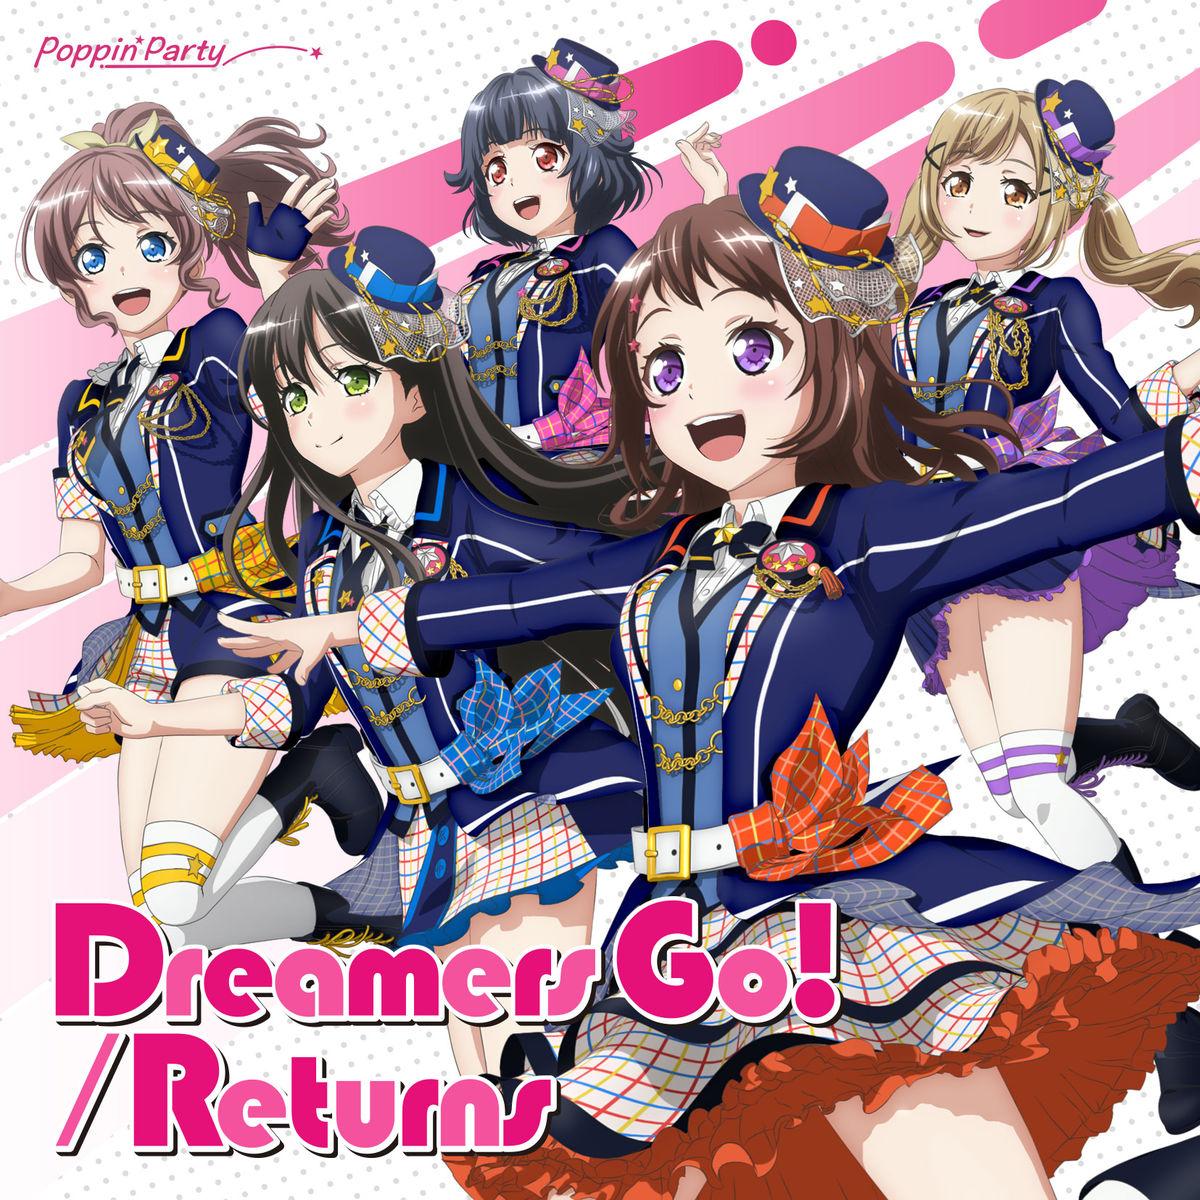 『Poppin'Party - Returns』収録の『Dreamers Go! / Returns』ジャケット